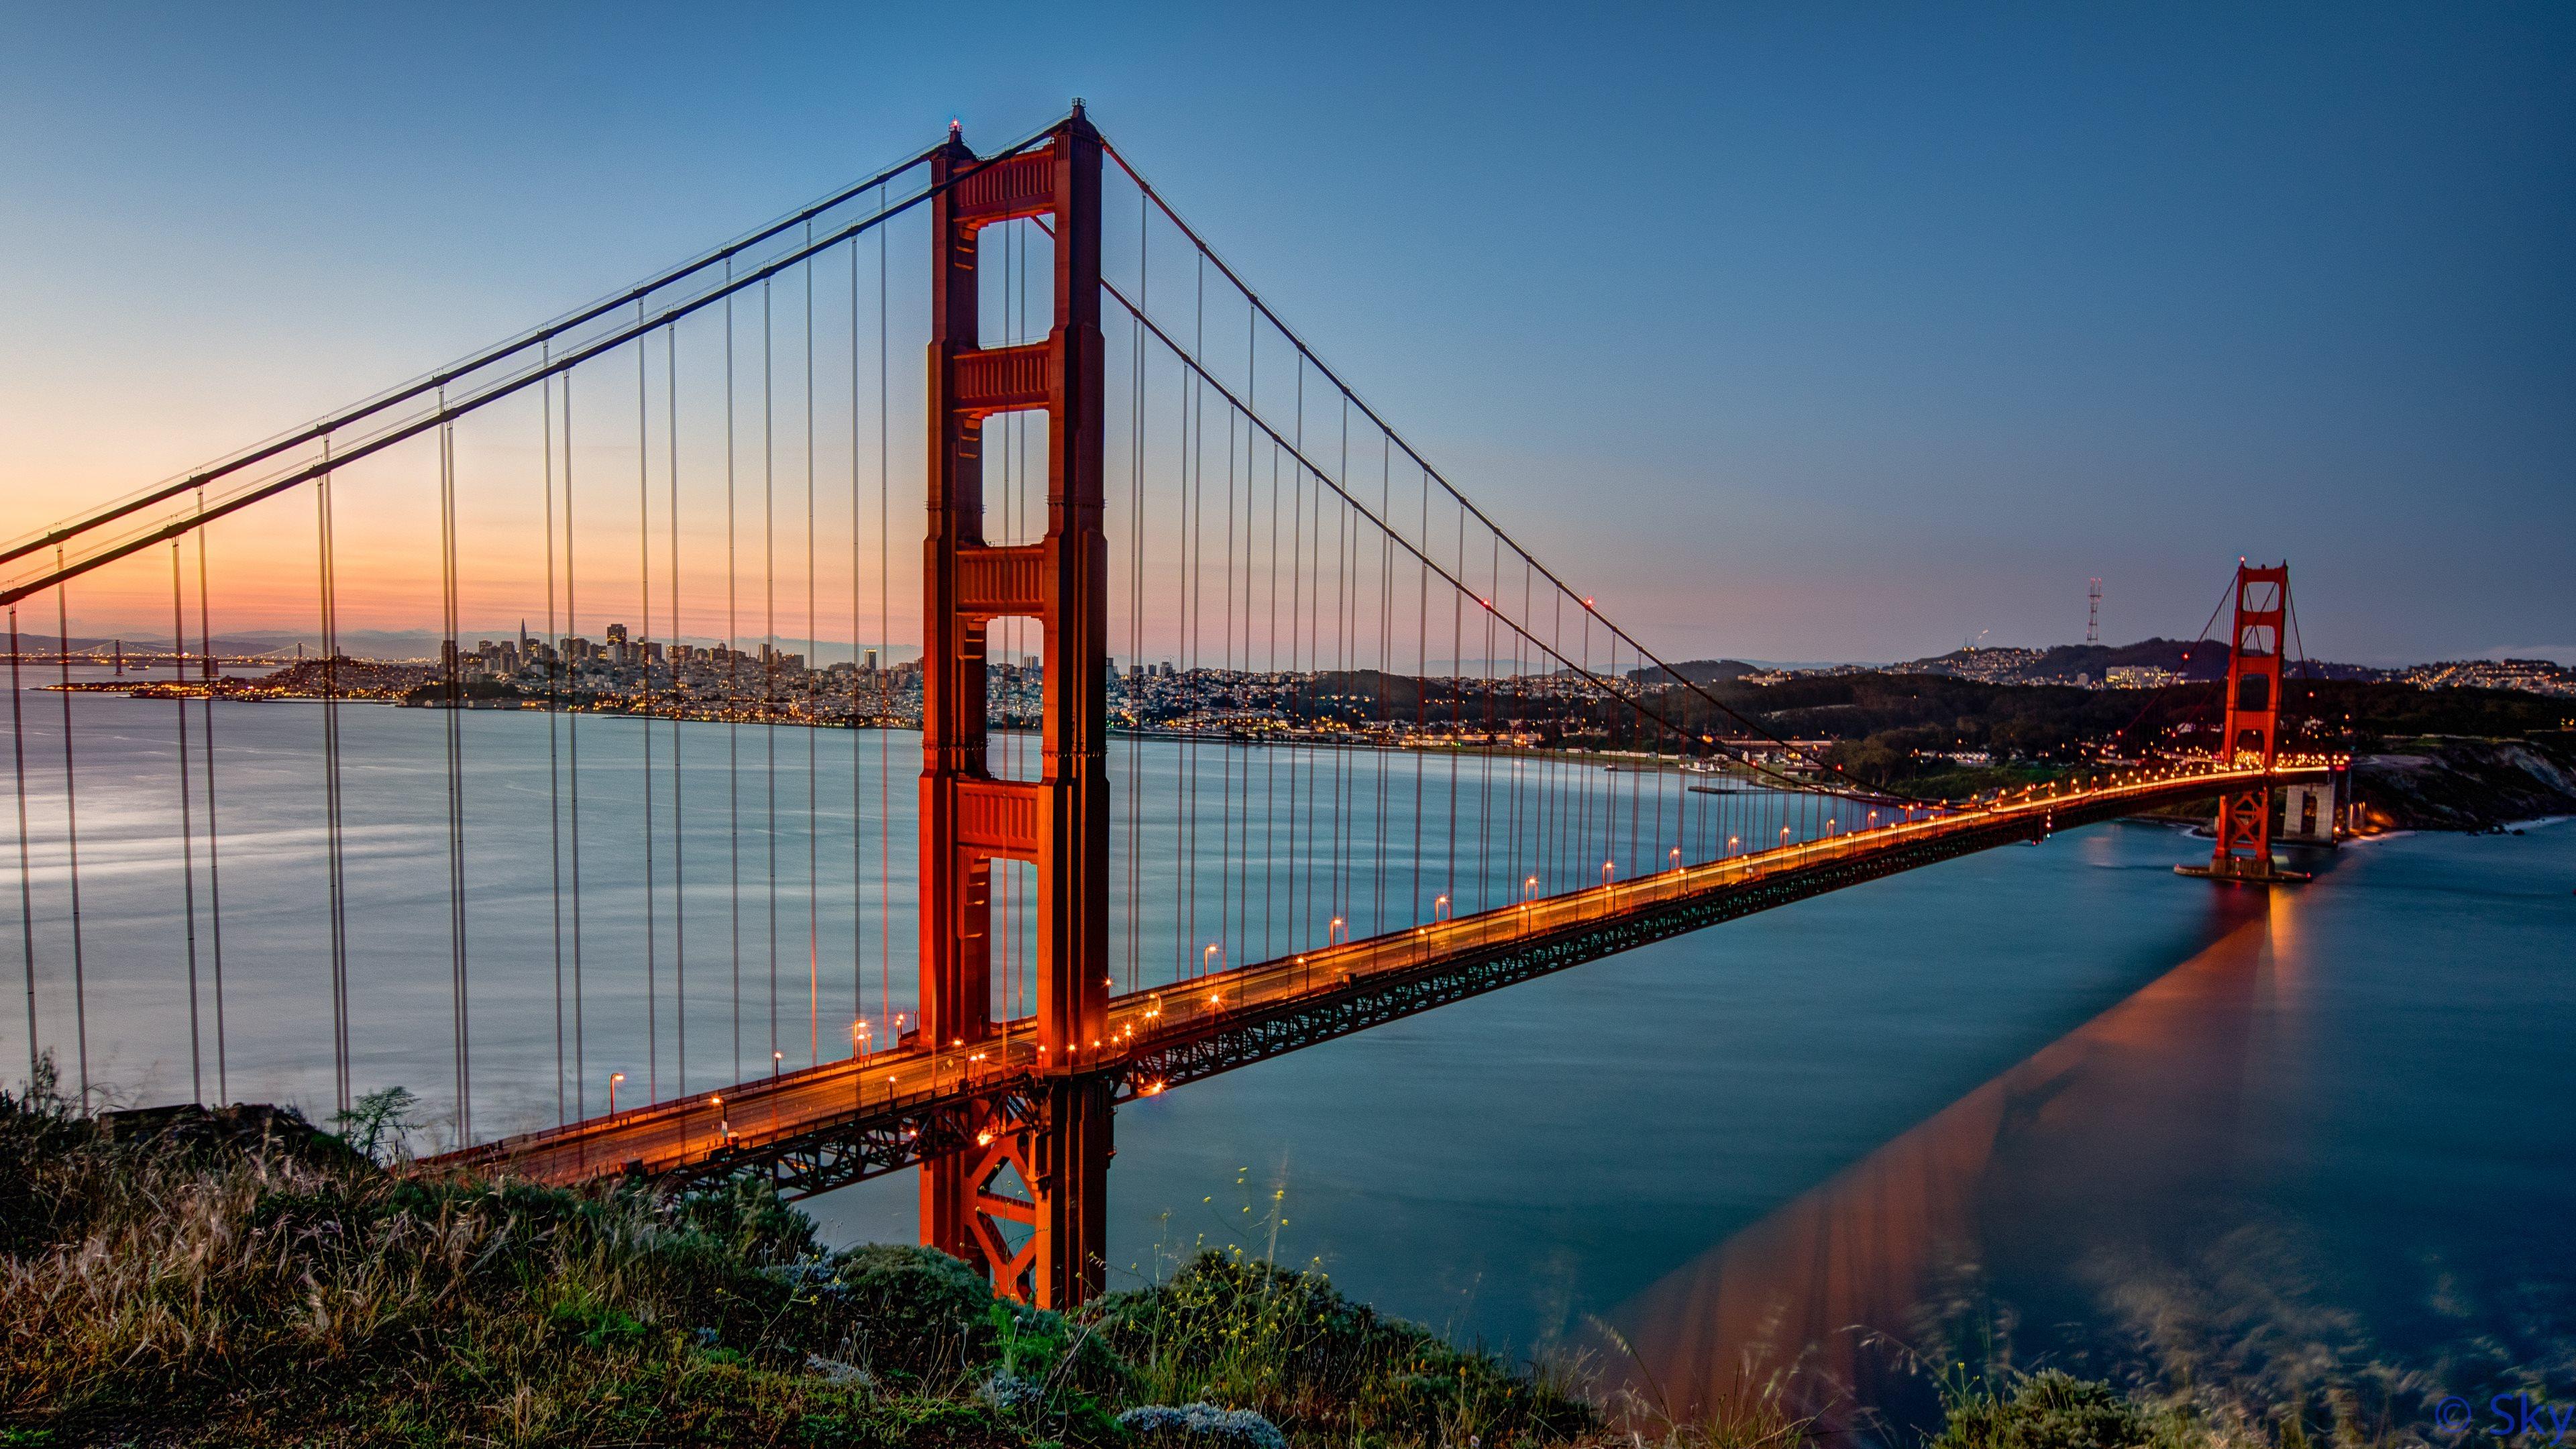 [45+] Wallpaper Golden Gate Bridge on WallpaperSafari